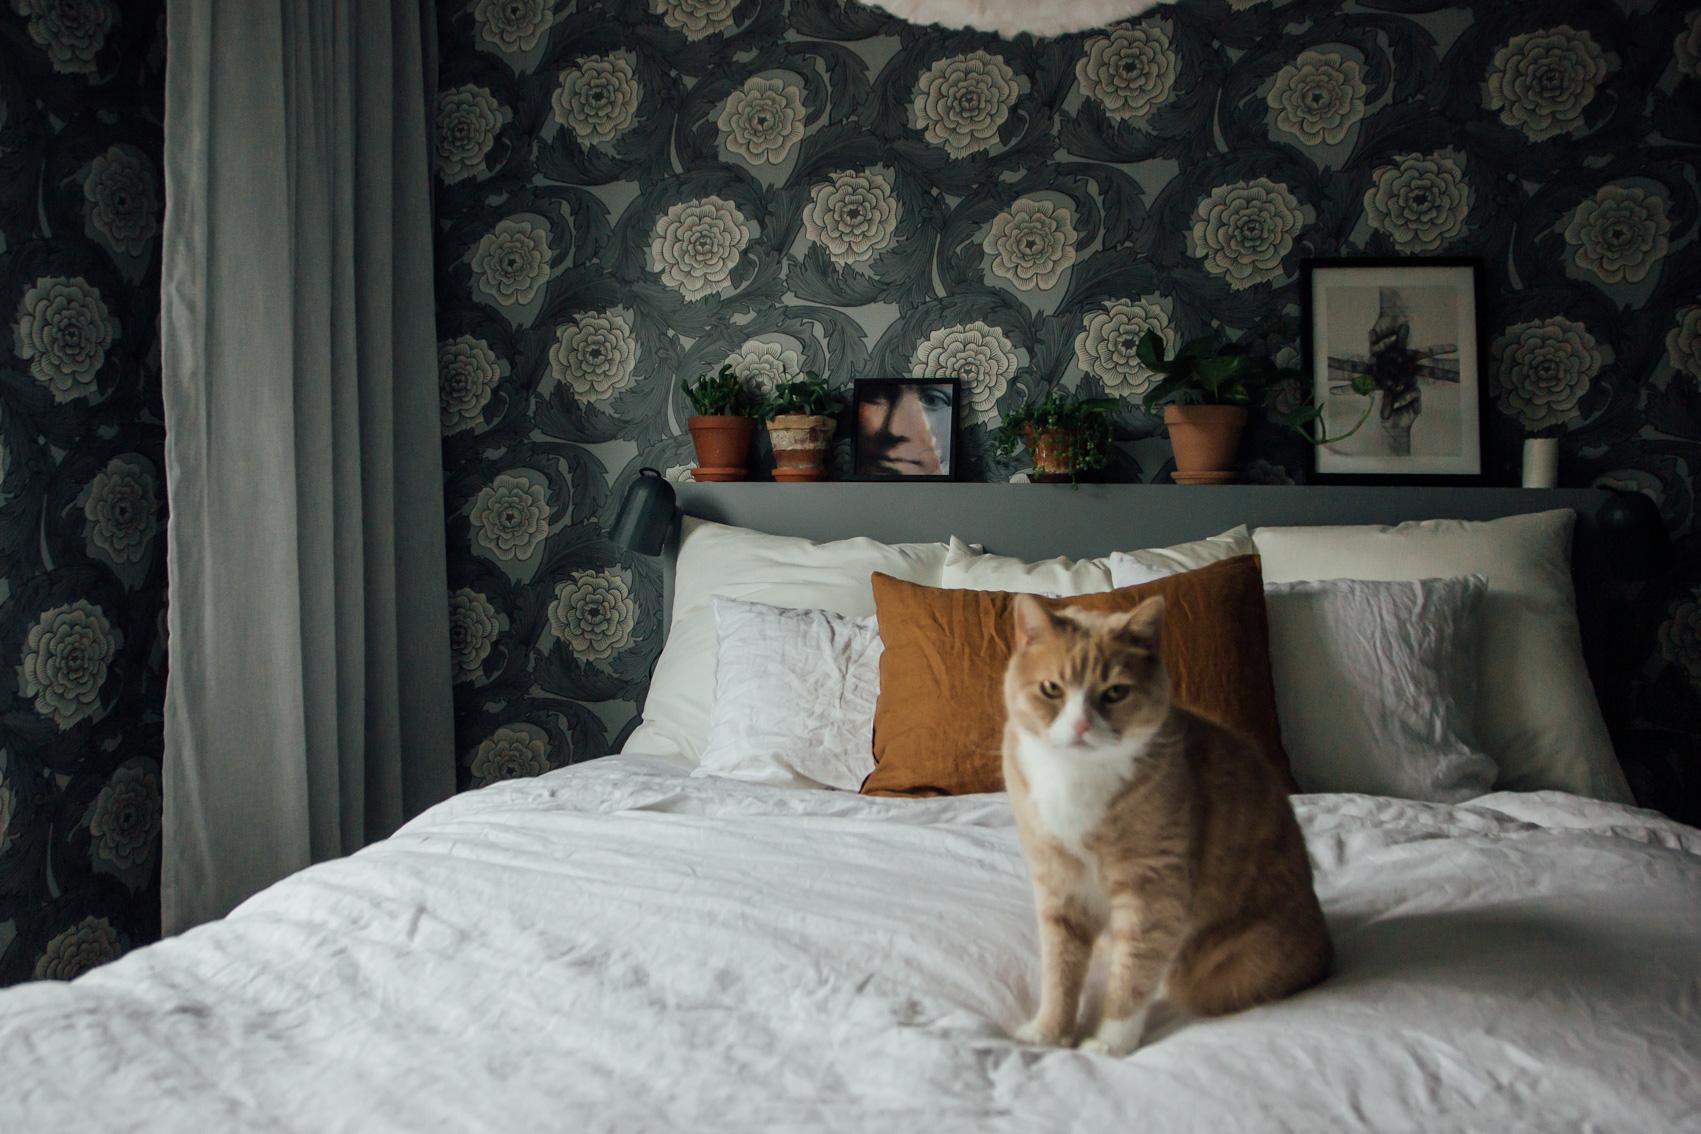 hemma hos trea katt sovrum midbec tapeter